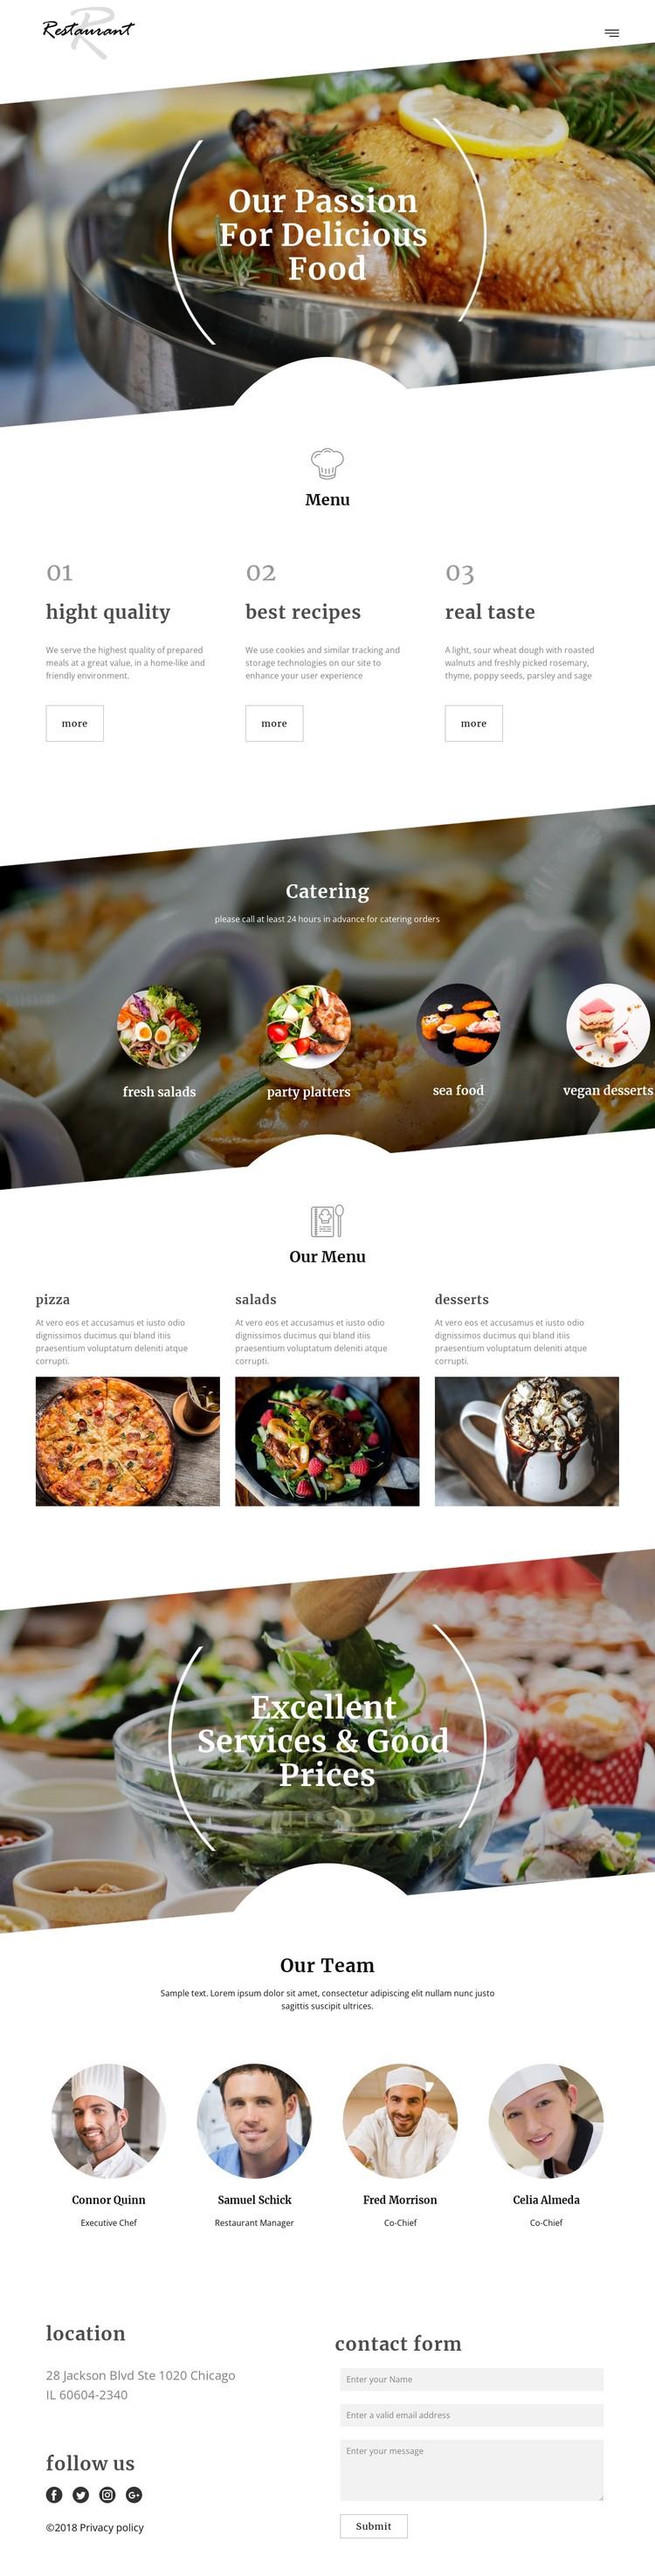 Executive chef recipes CSS Template